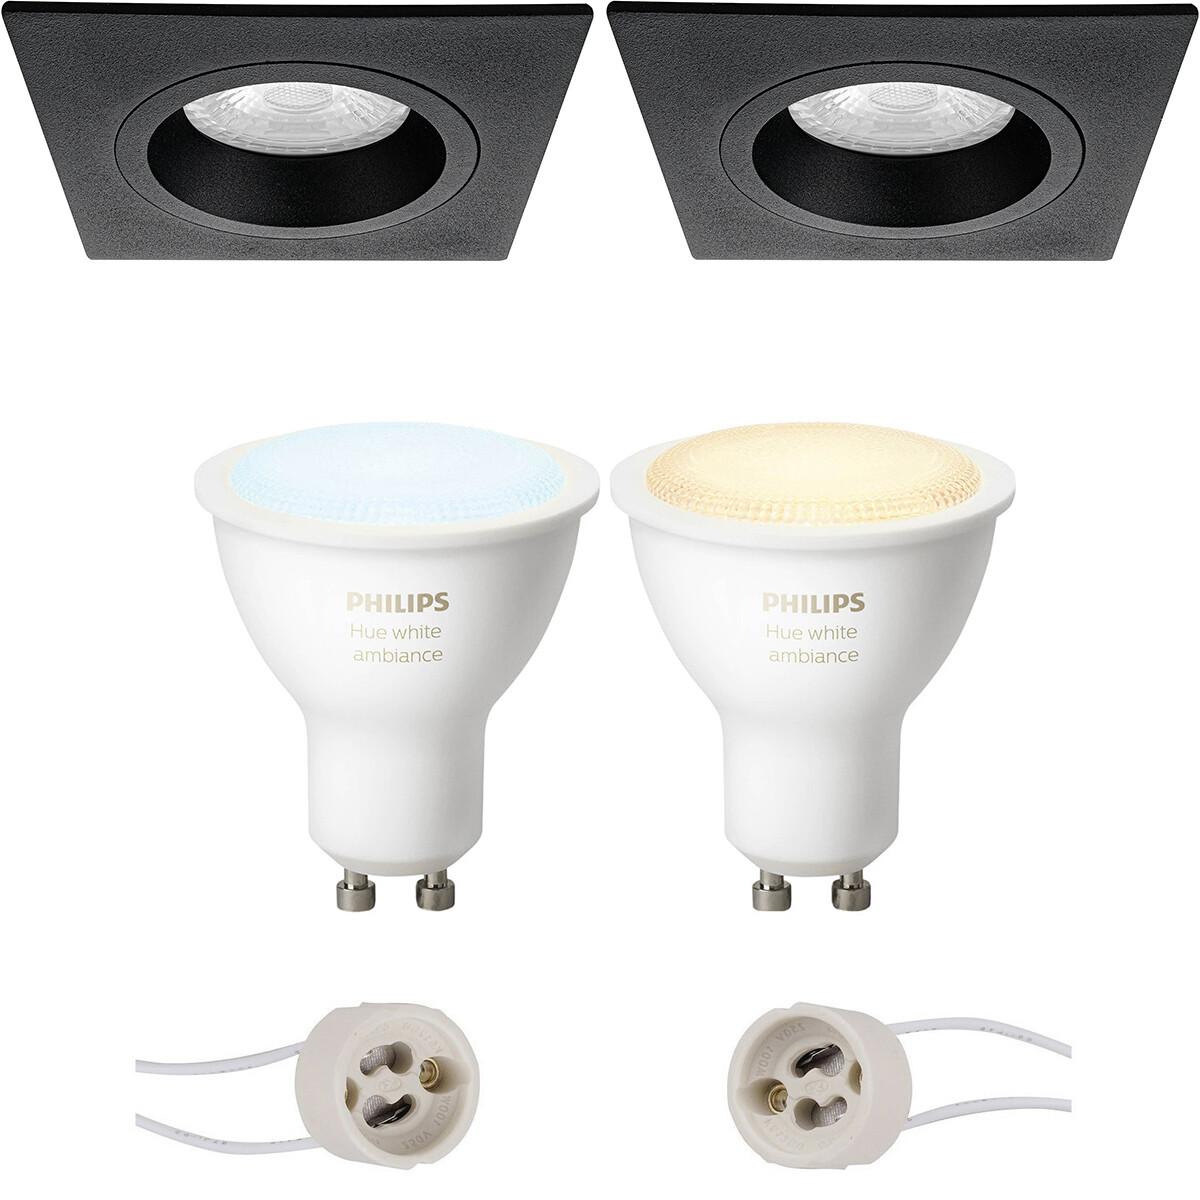 Pragmi Rodos Pro - Inbouw Vierkant - Mat Zwart - 93mm - Philips Hue - LED Spot Set GU10 - White Ambi